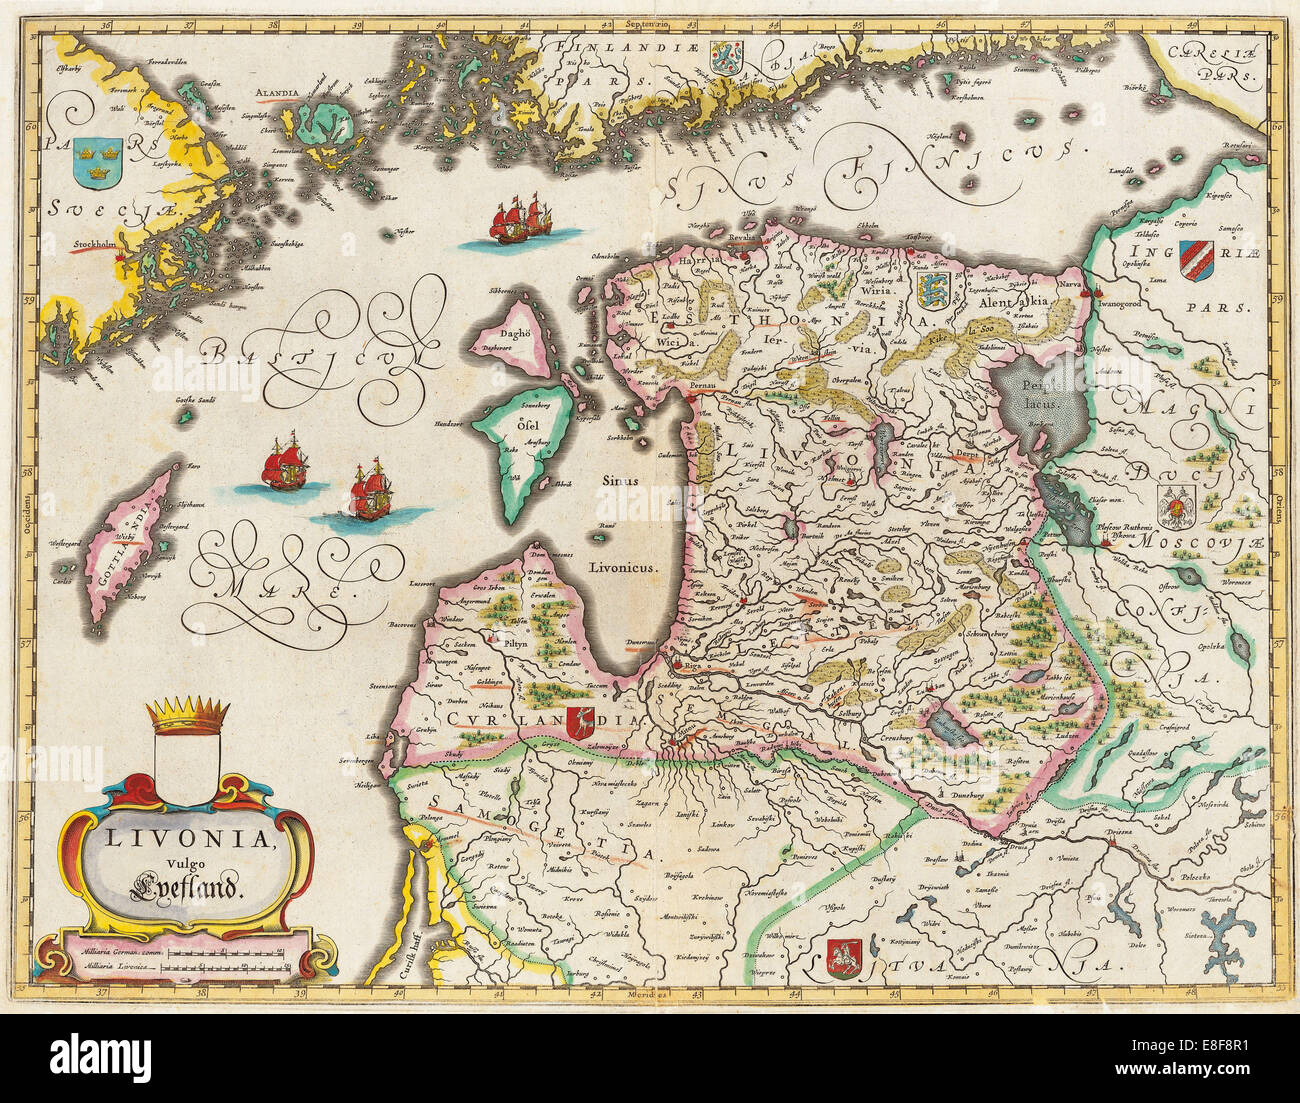 Livonia Karte, Vulgo Lyefland, Atlas Maior. Künstler: Blaeu, Joan (1596-1673) Stockbild